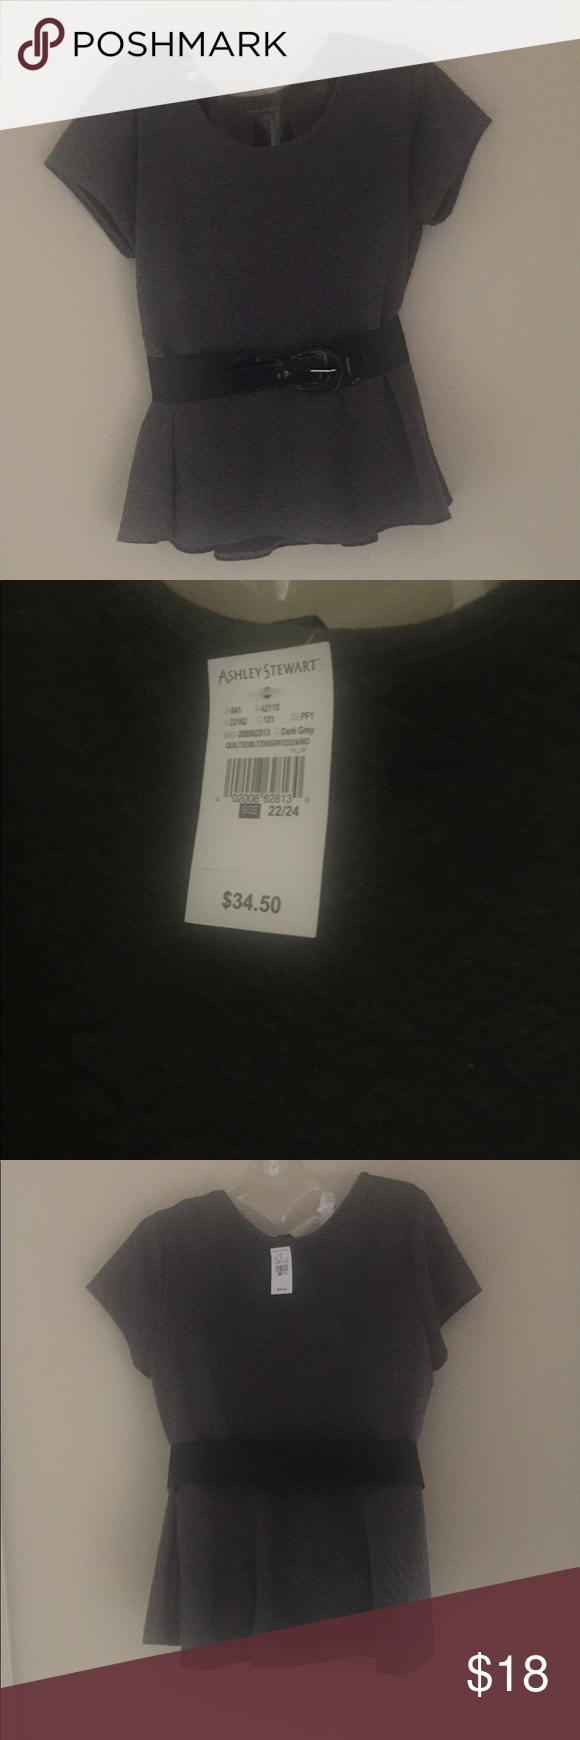 b2cfbd6cd6 Gray Peplum Belted Blouse Ashley Stewart gray peplum blouse with elastic  and patent leather belt. NWT. Size 22 24 Ashley Stewart Tops Blouses